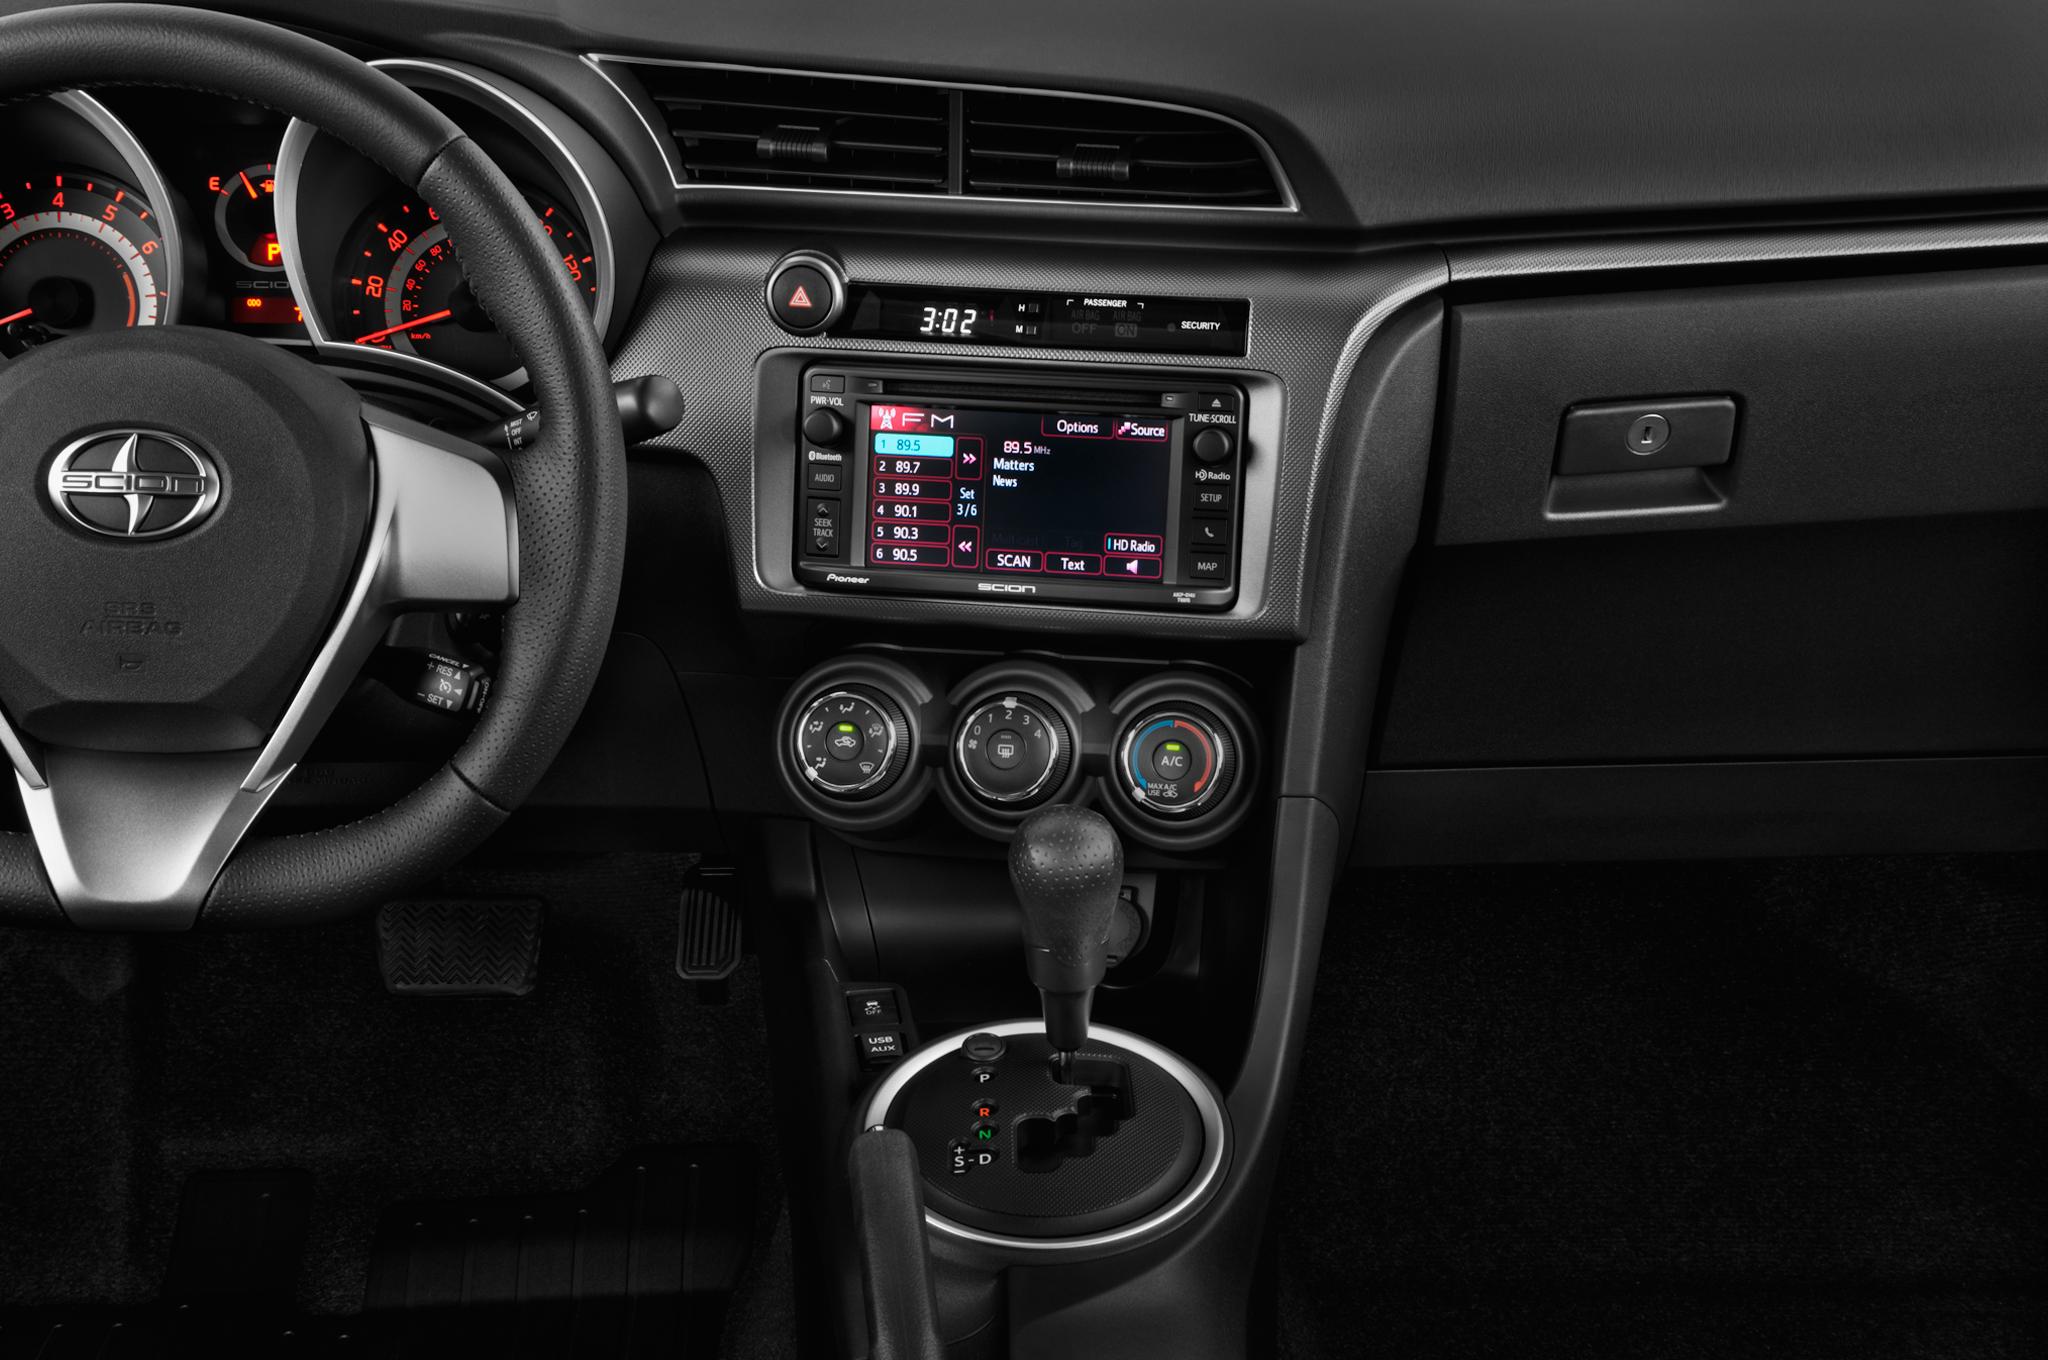 2015 Scion Tc 0 60 >> 2015 Scion FR-S Receives Suspension Tweaks - Automobile Magazine